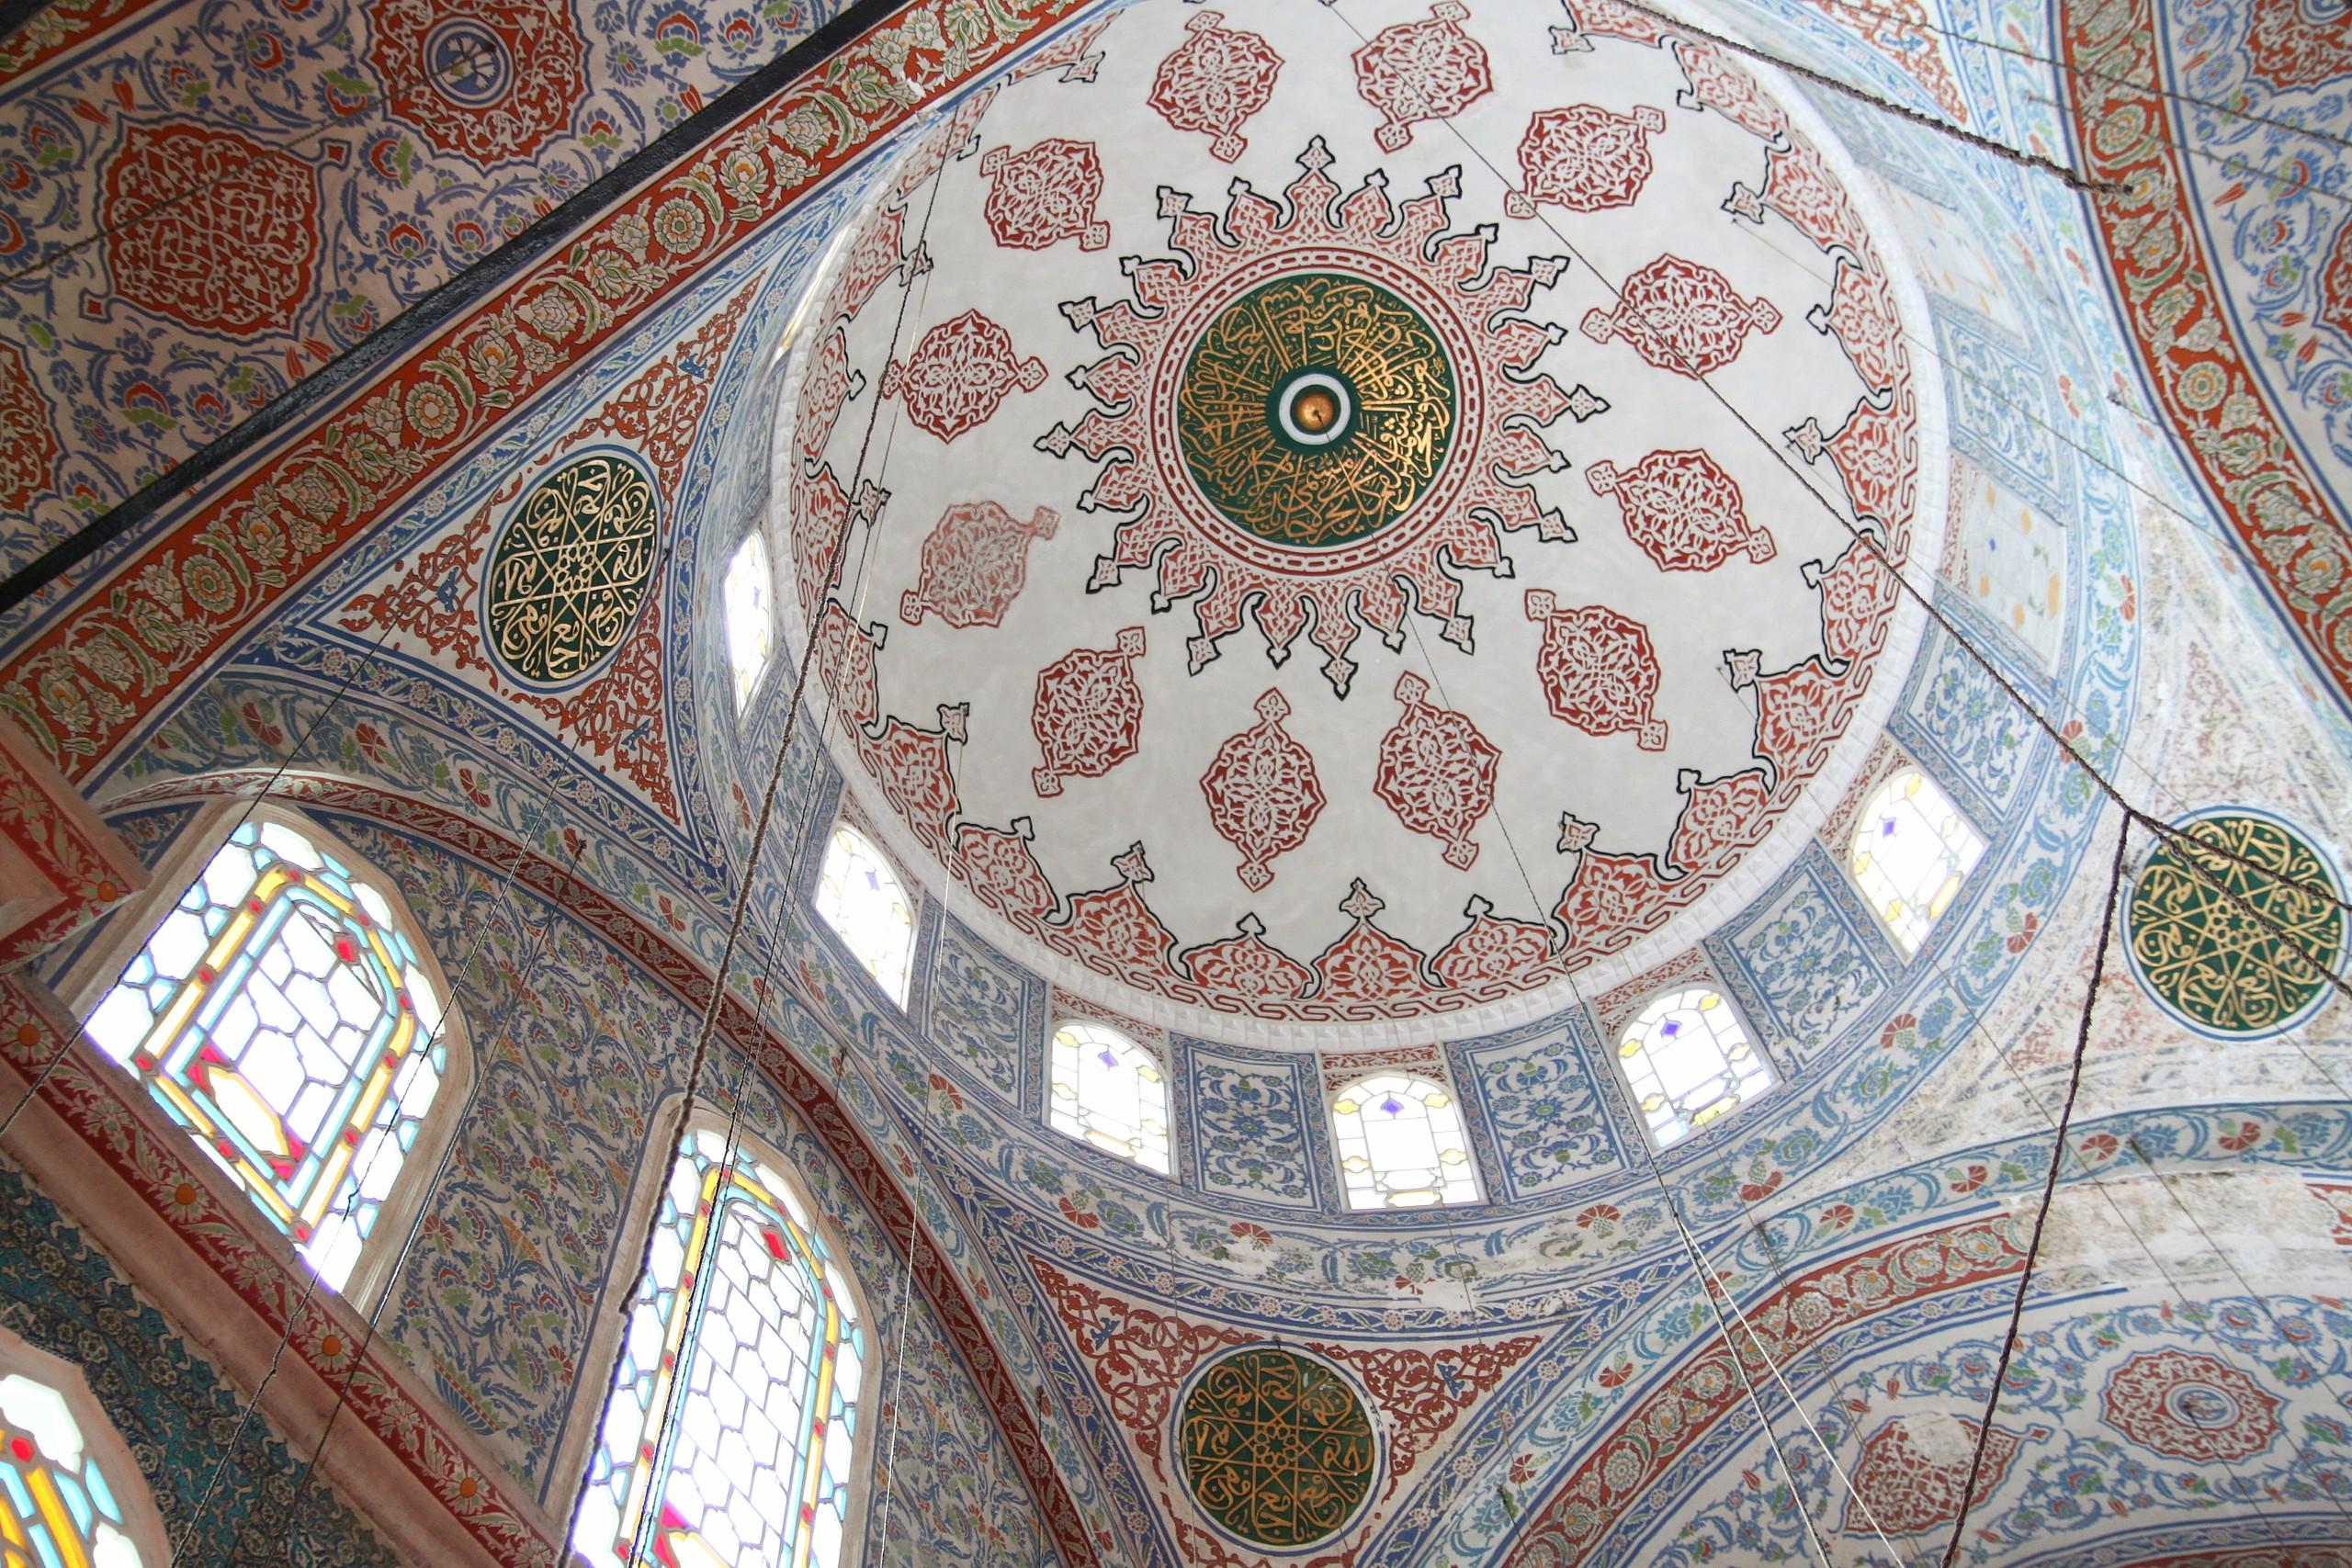 Pırlantadan Kubbeler #5: Sultanahmed - NE80kO - Pırlantadan Kubbeler #5: Sultanahmed